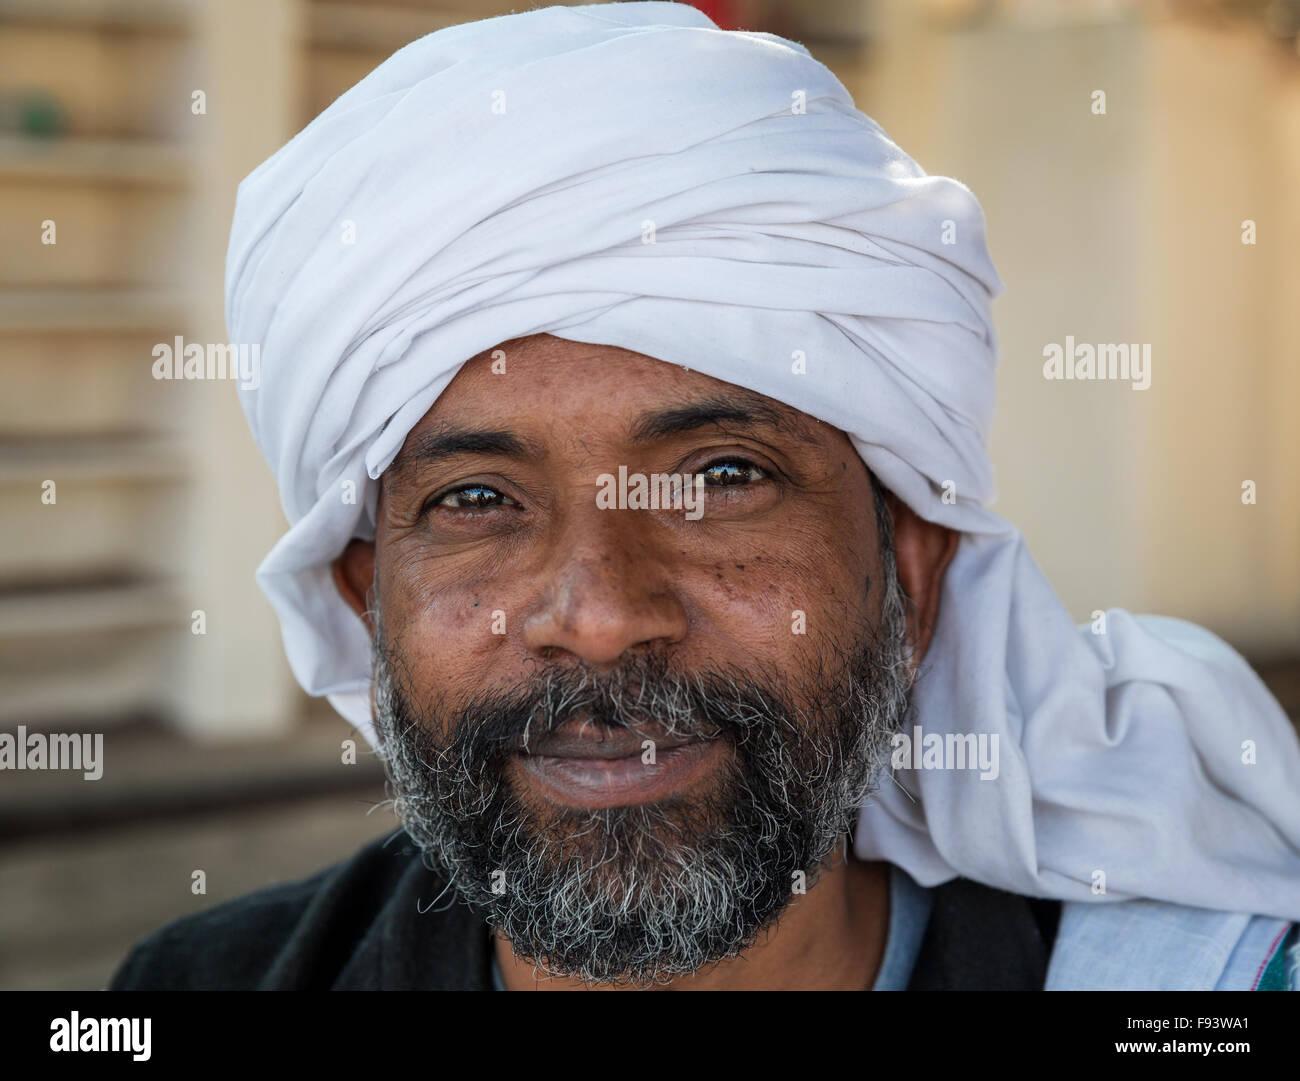 Sadhu with a white turban, Pushkar, Rajasthan, India - Stock Image